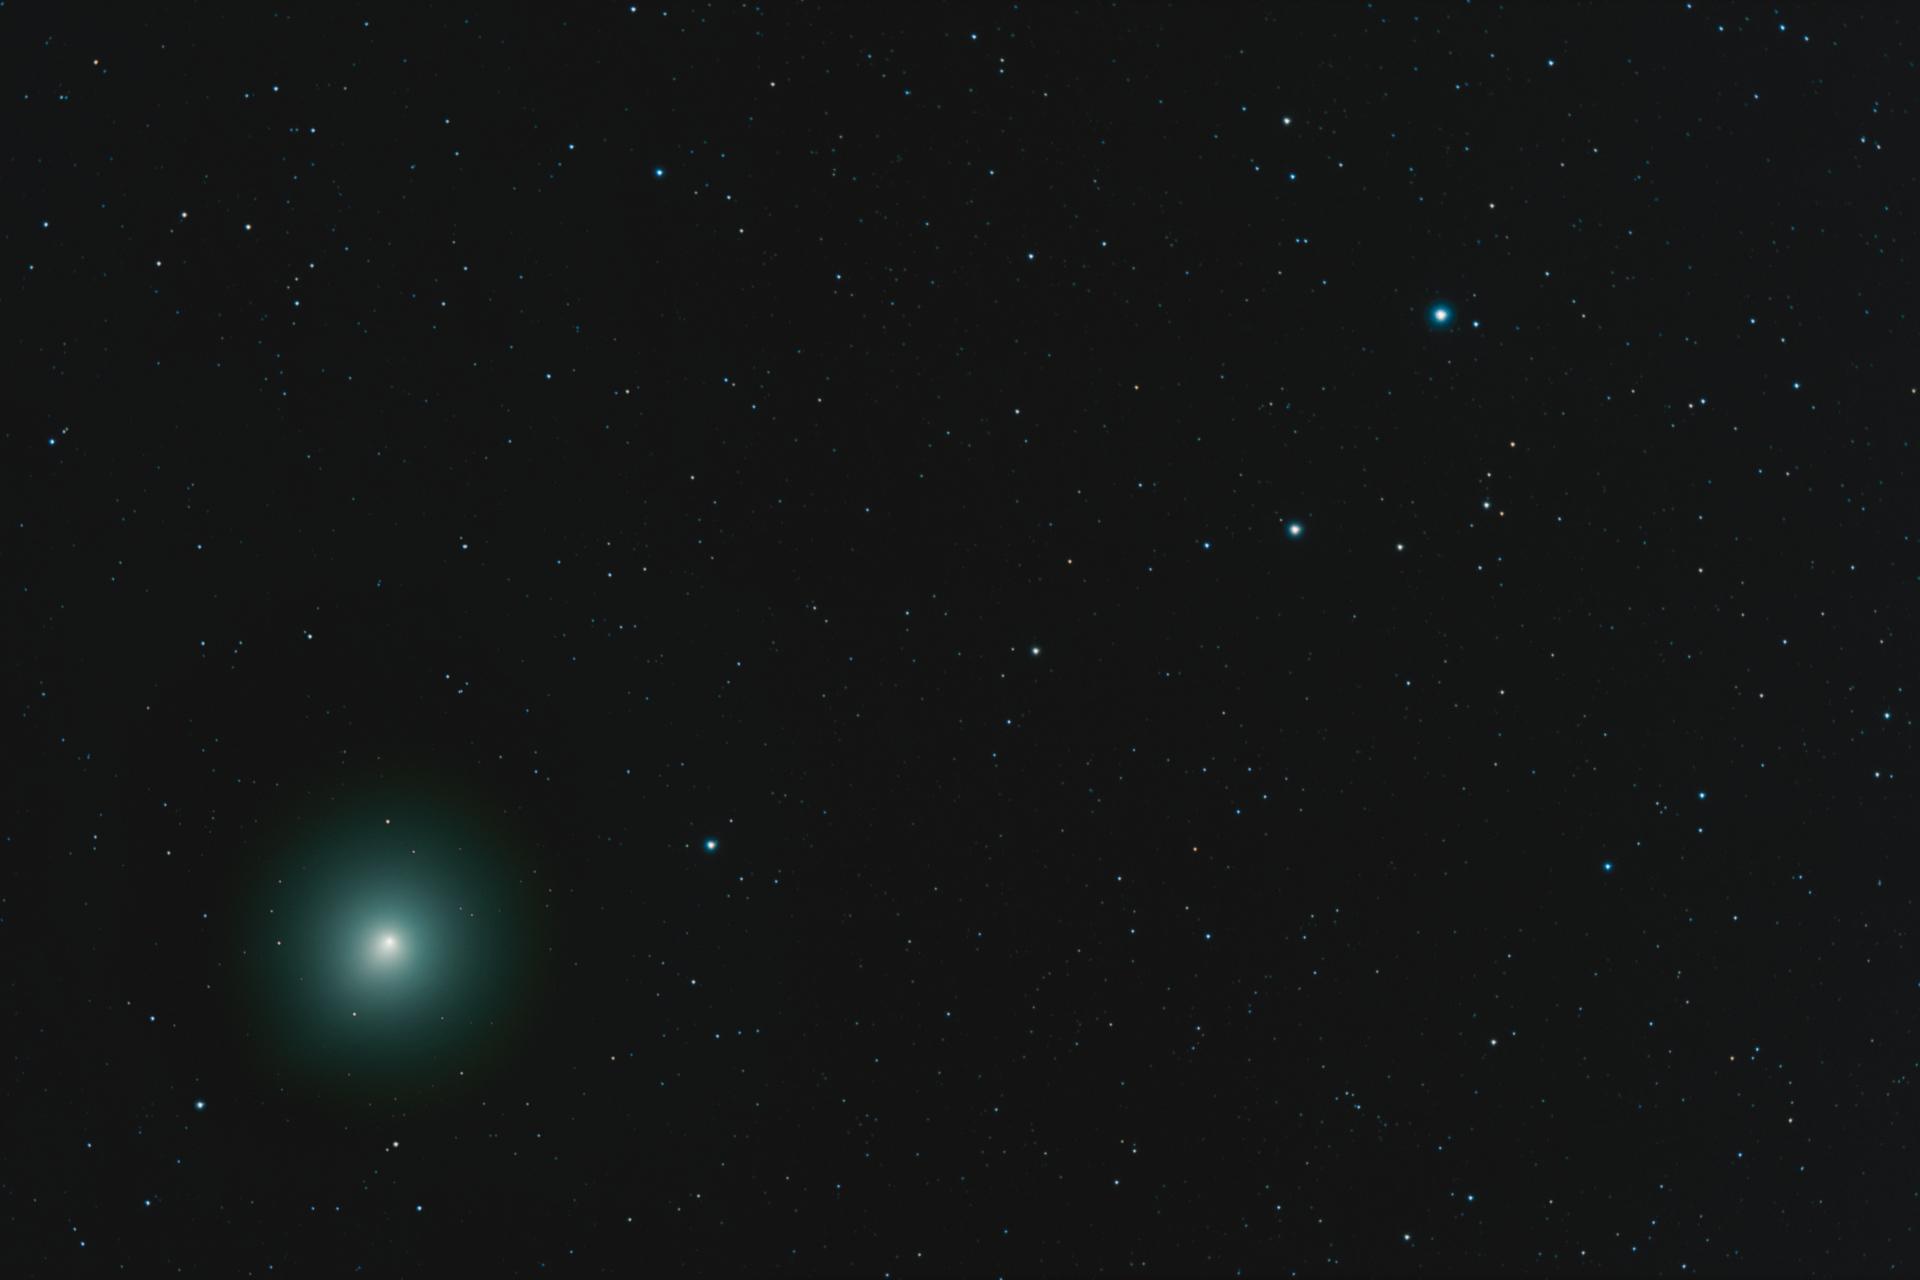 Comète 46P/Wirtanen